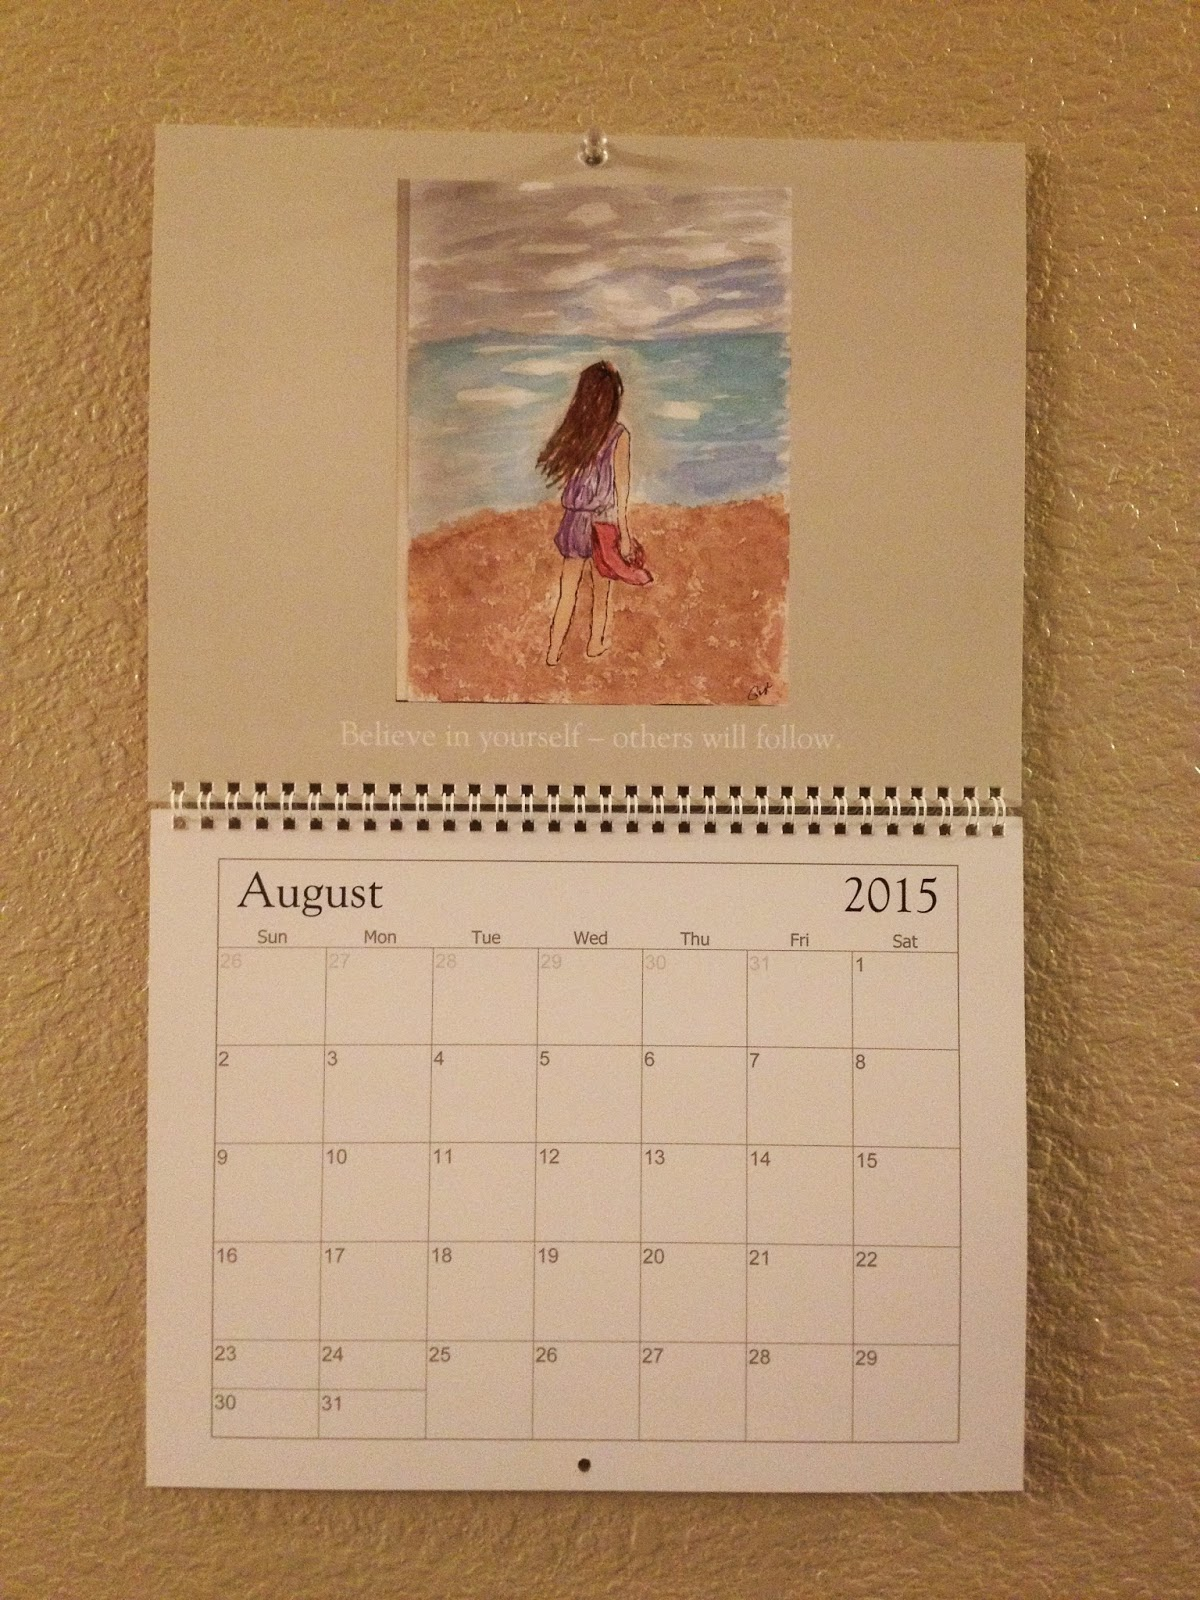 The Calendars are Here! The Calendars are Here!